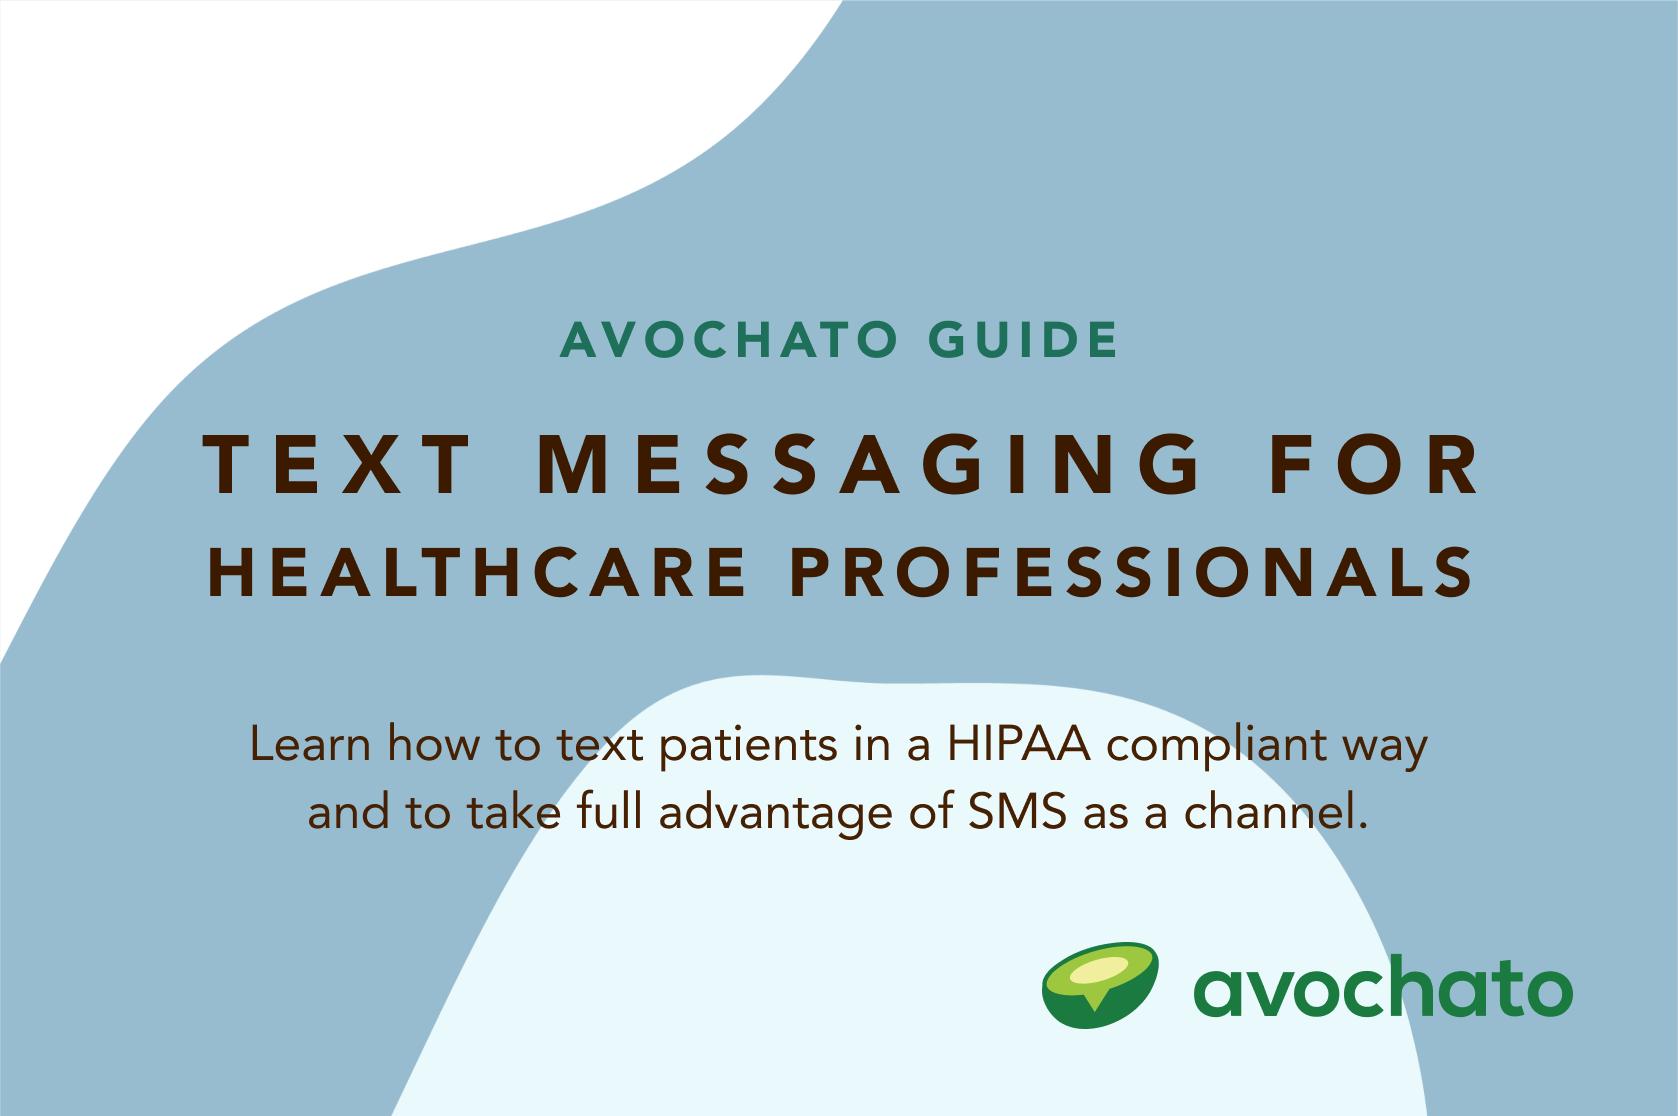 HIPAA compliant sms